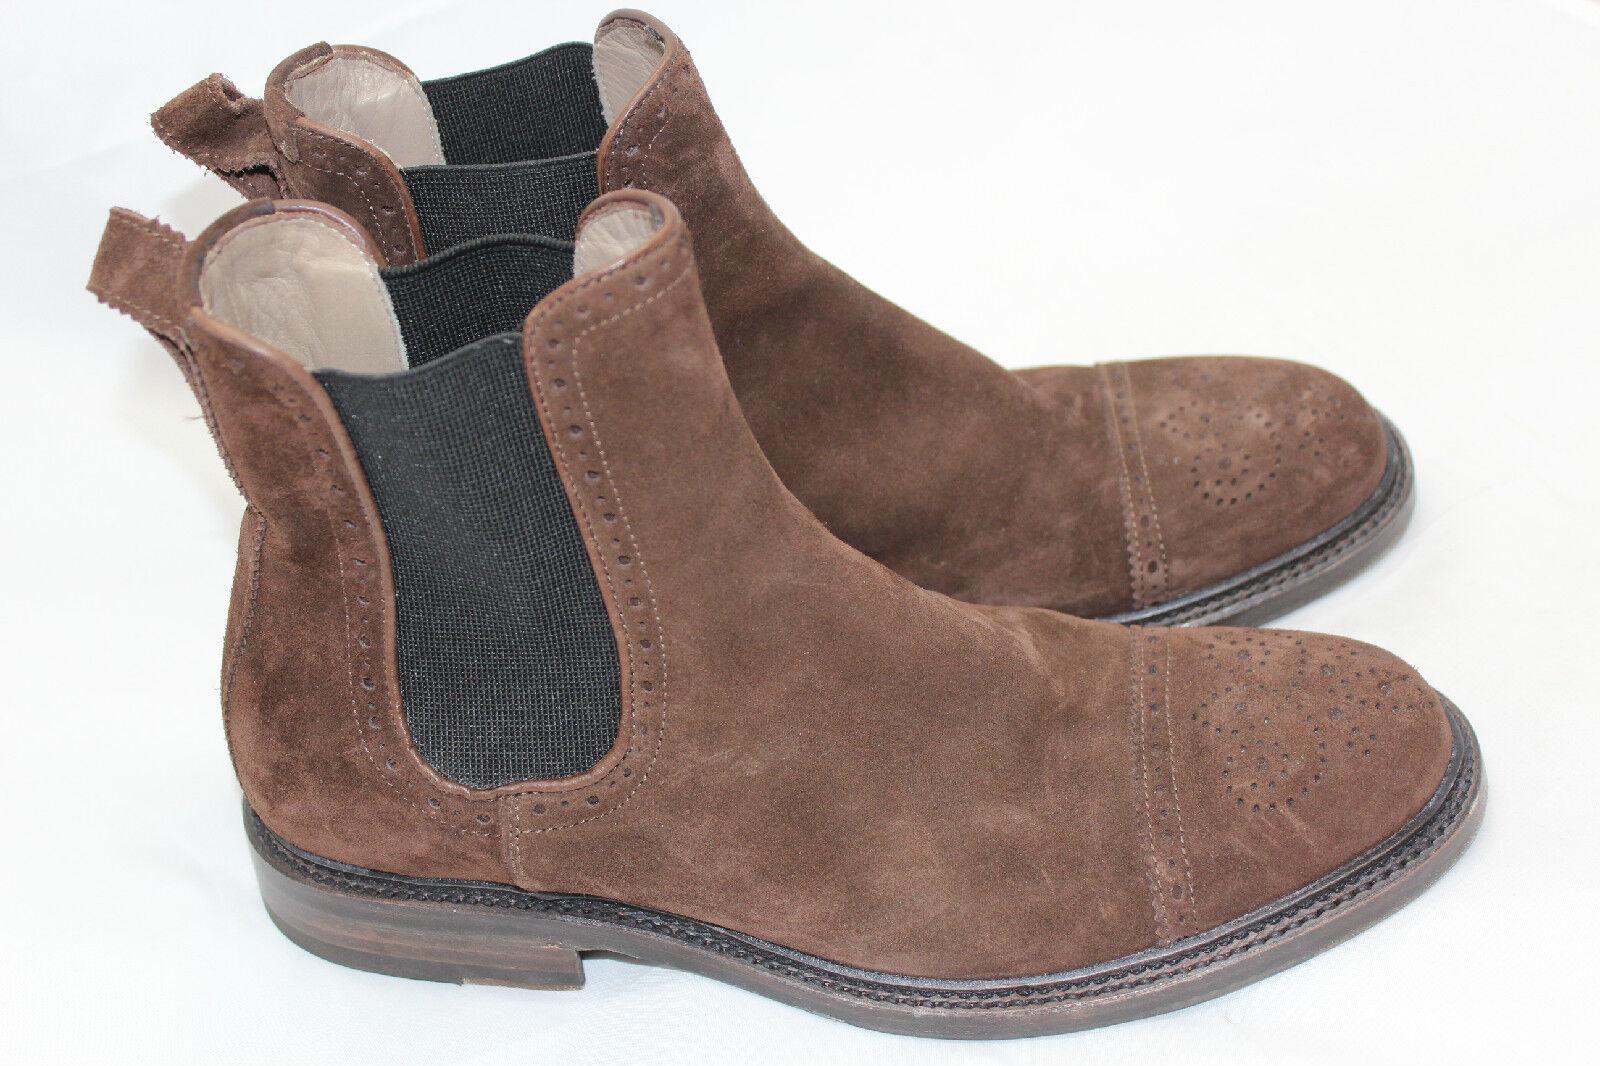 700+ Uomo Aquatalia 'Freddy' Chelsea Boot Brown Suede Pull On Size 9 (Q6)